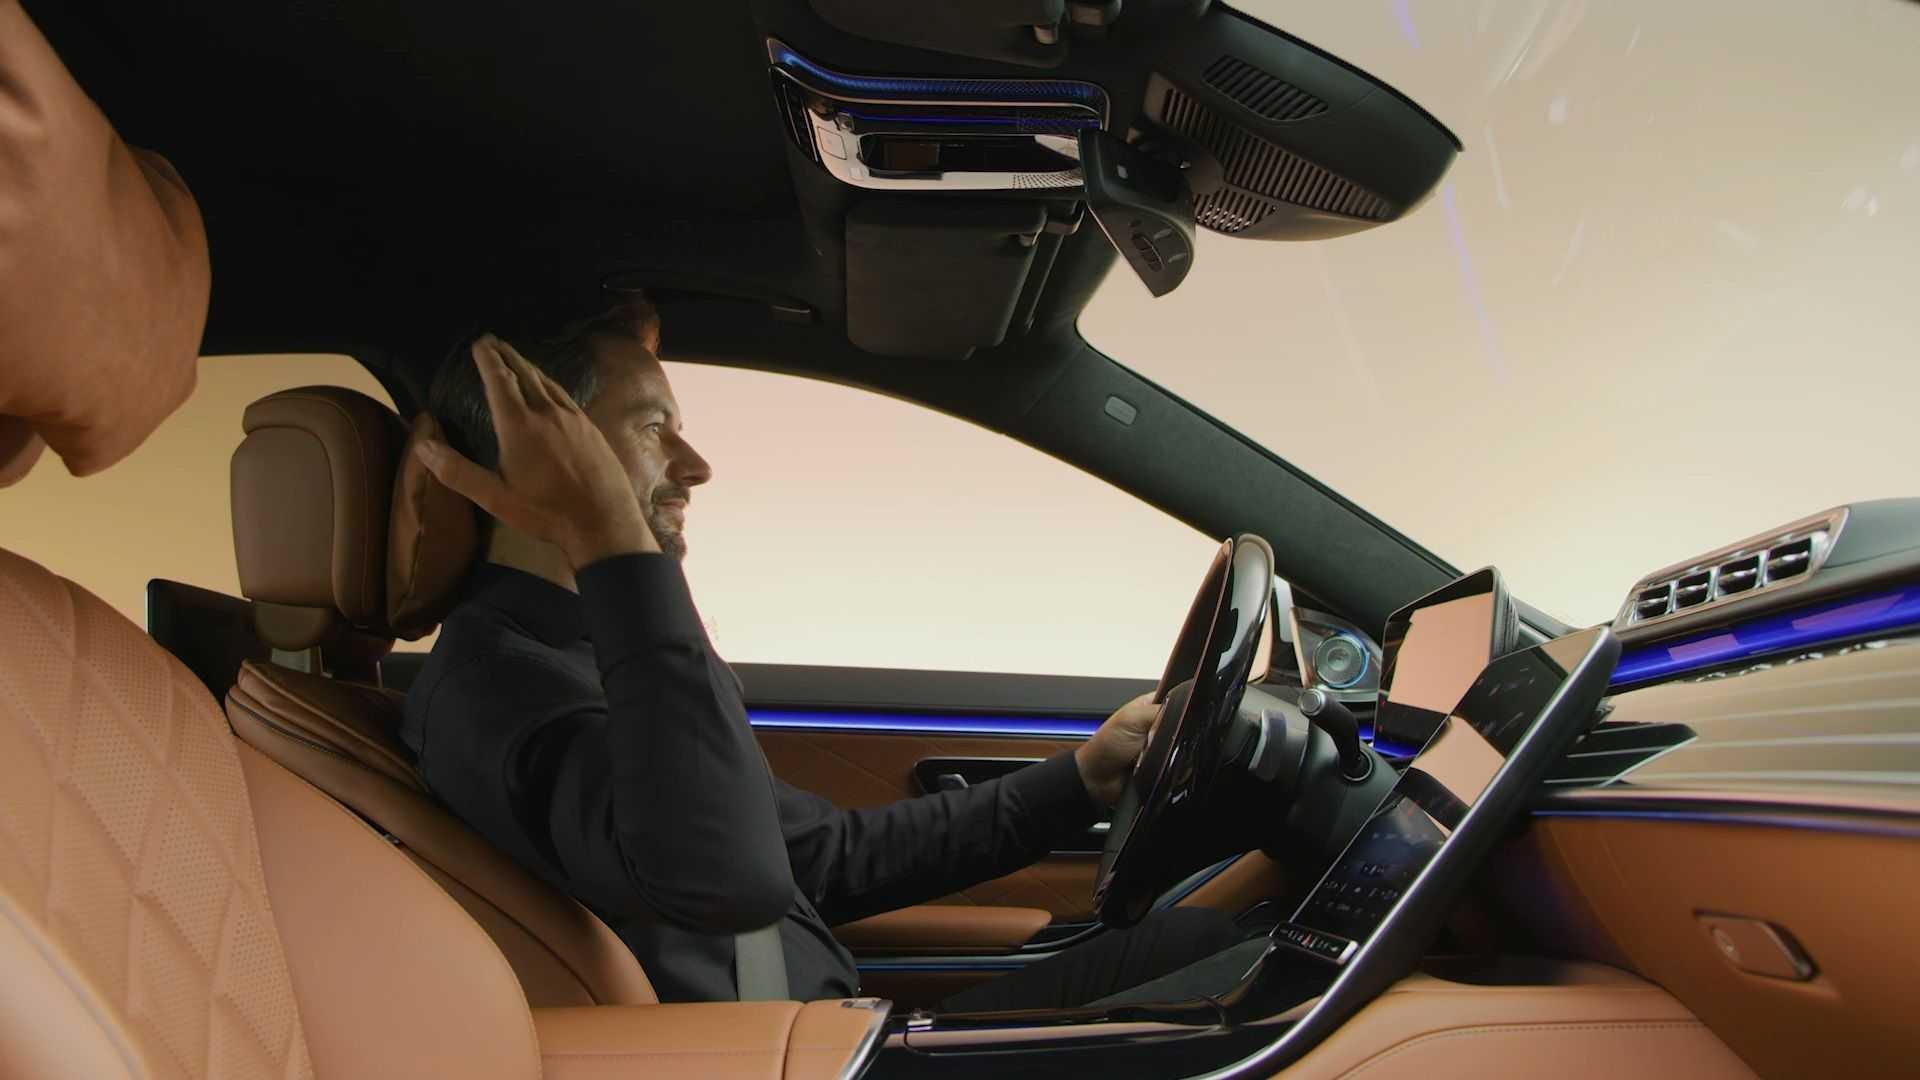 2021-mercedes-s-class-interior-16